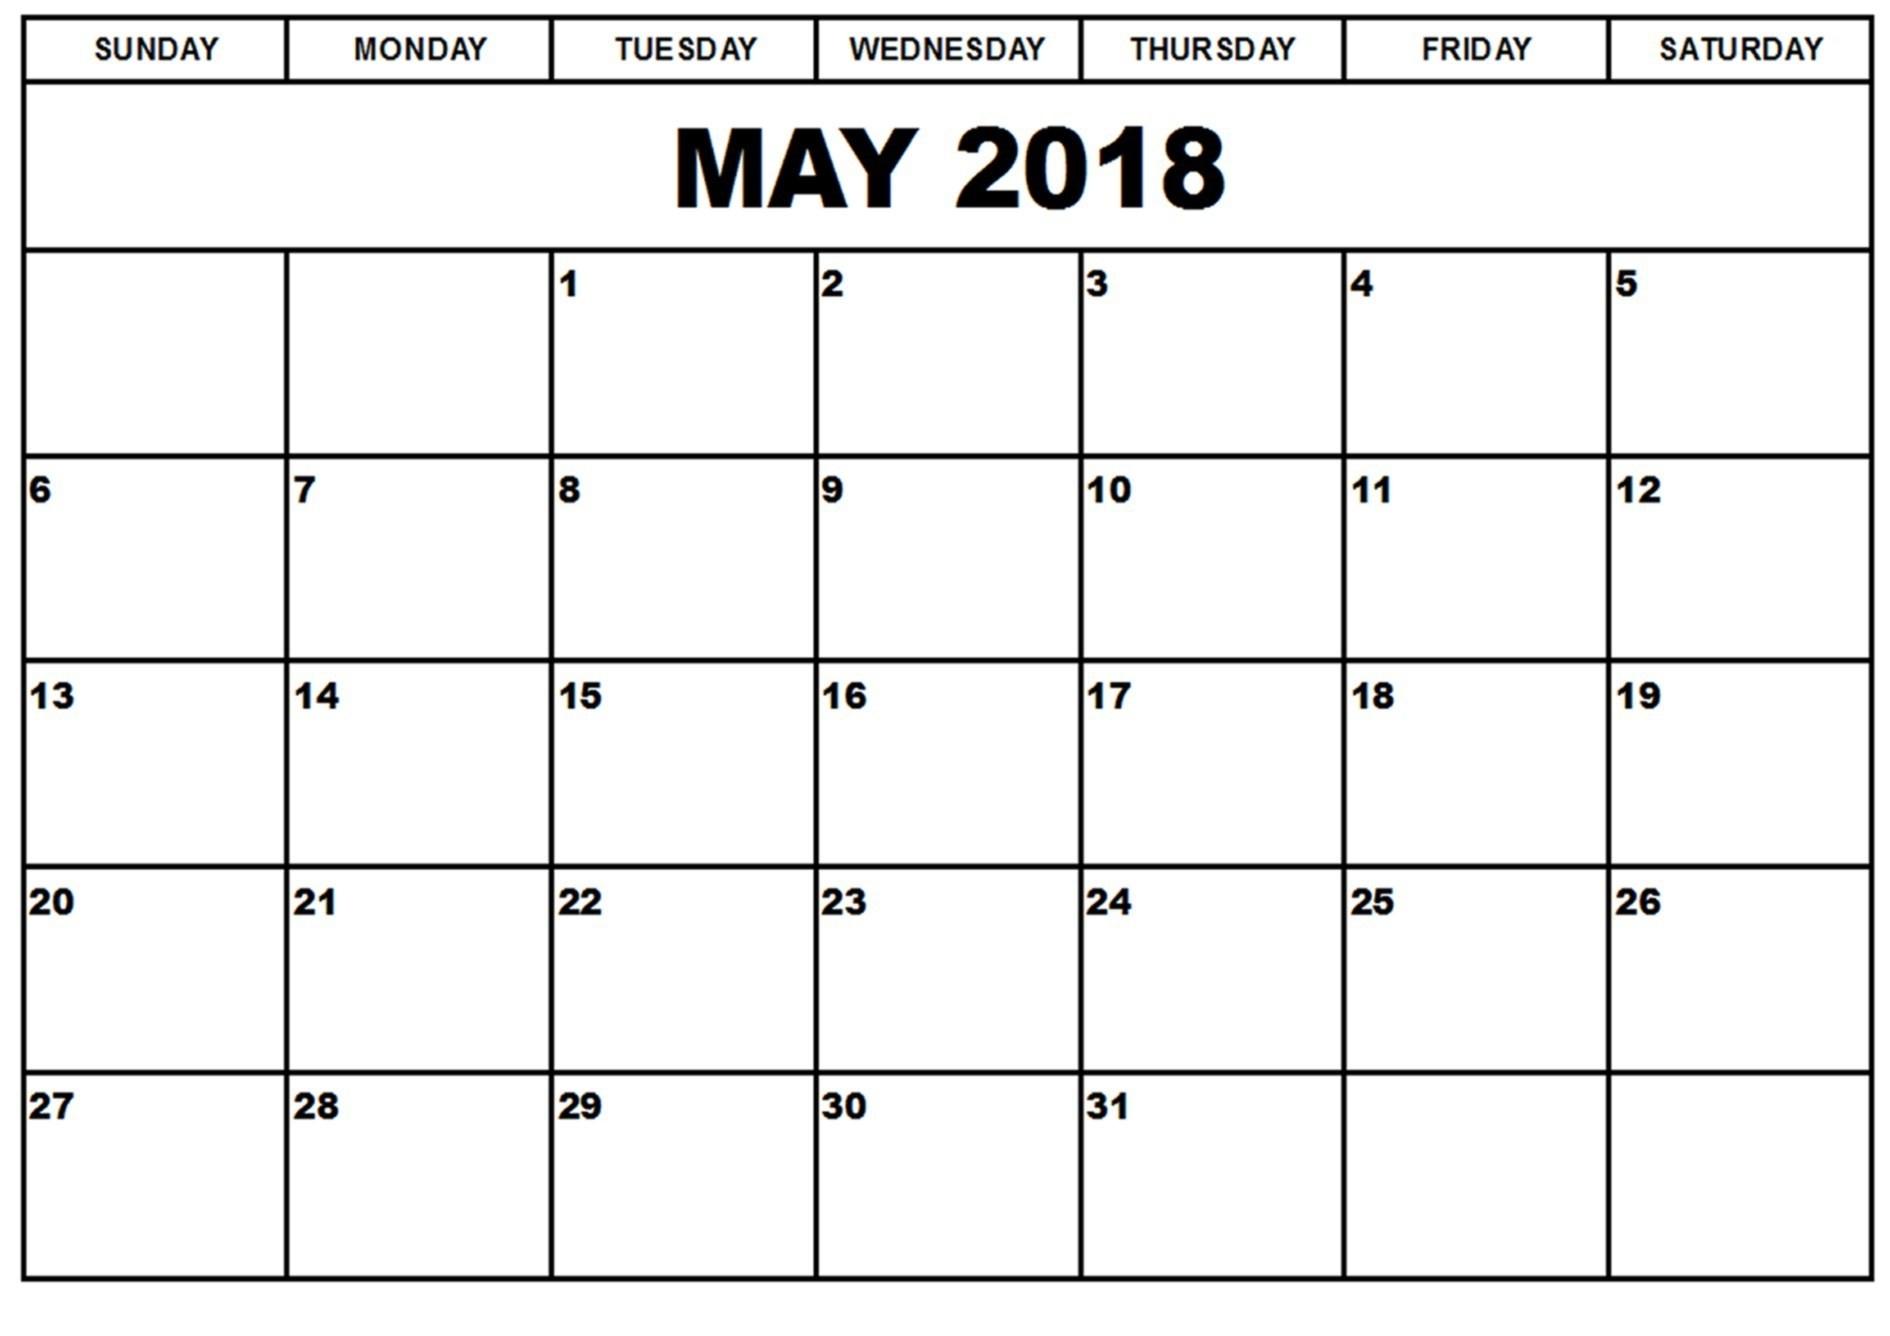 May 2018 Calendar Template For Sunday Through Saturday